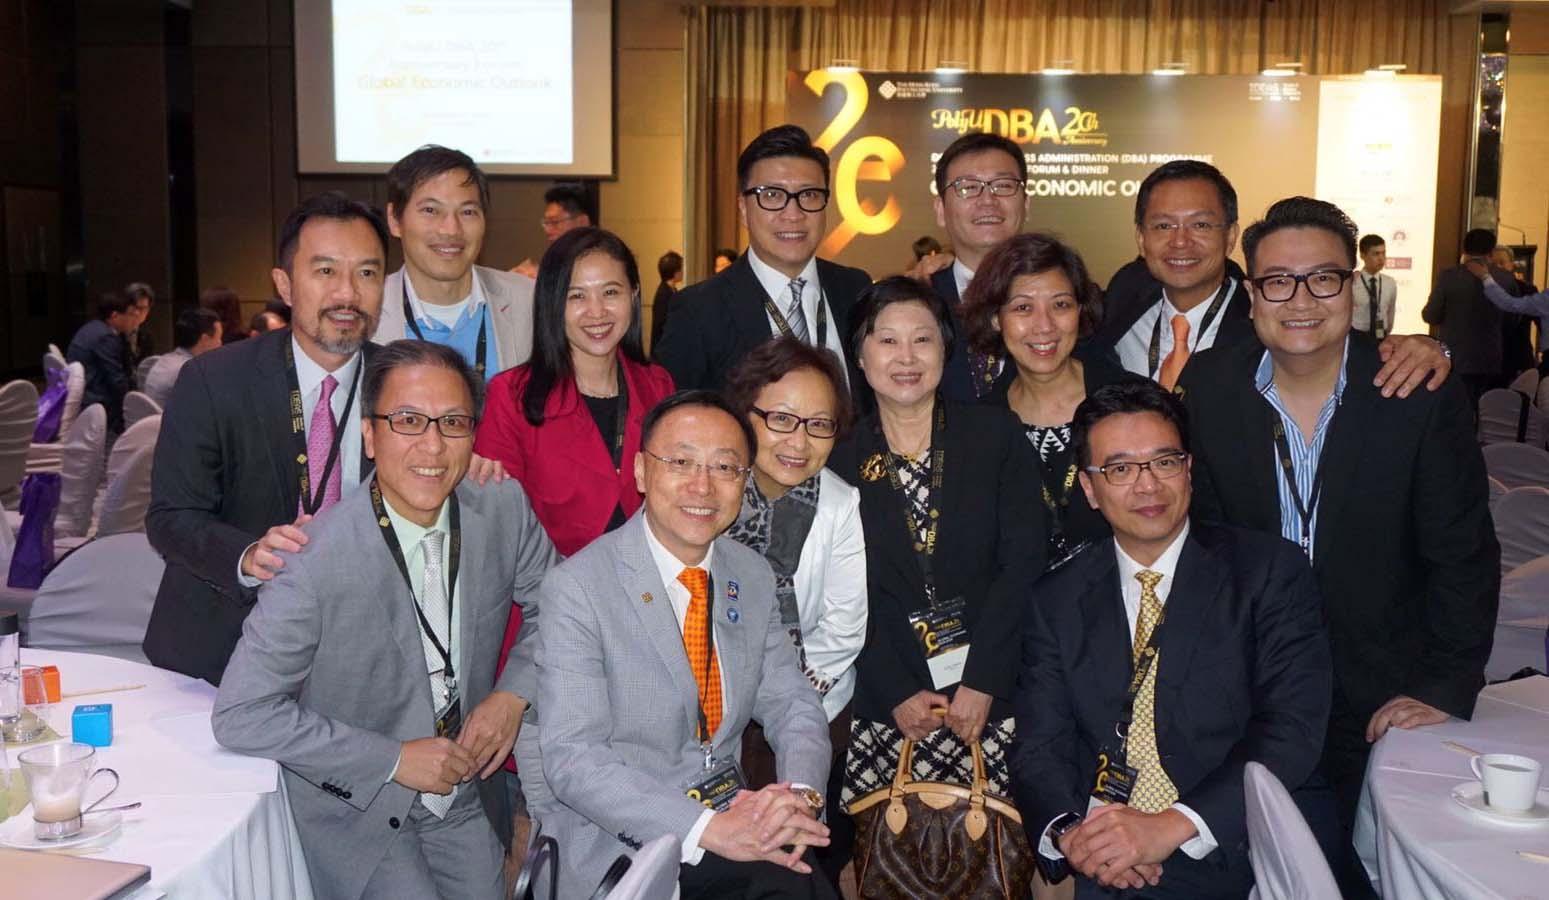 PolyU DBA 20th Anniversary Forum and Sharing 18/11/2016